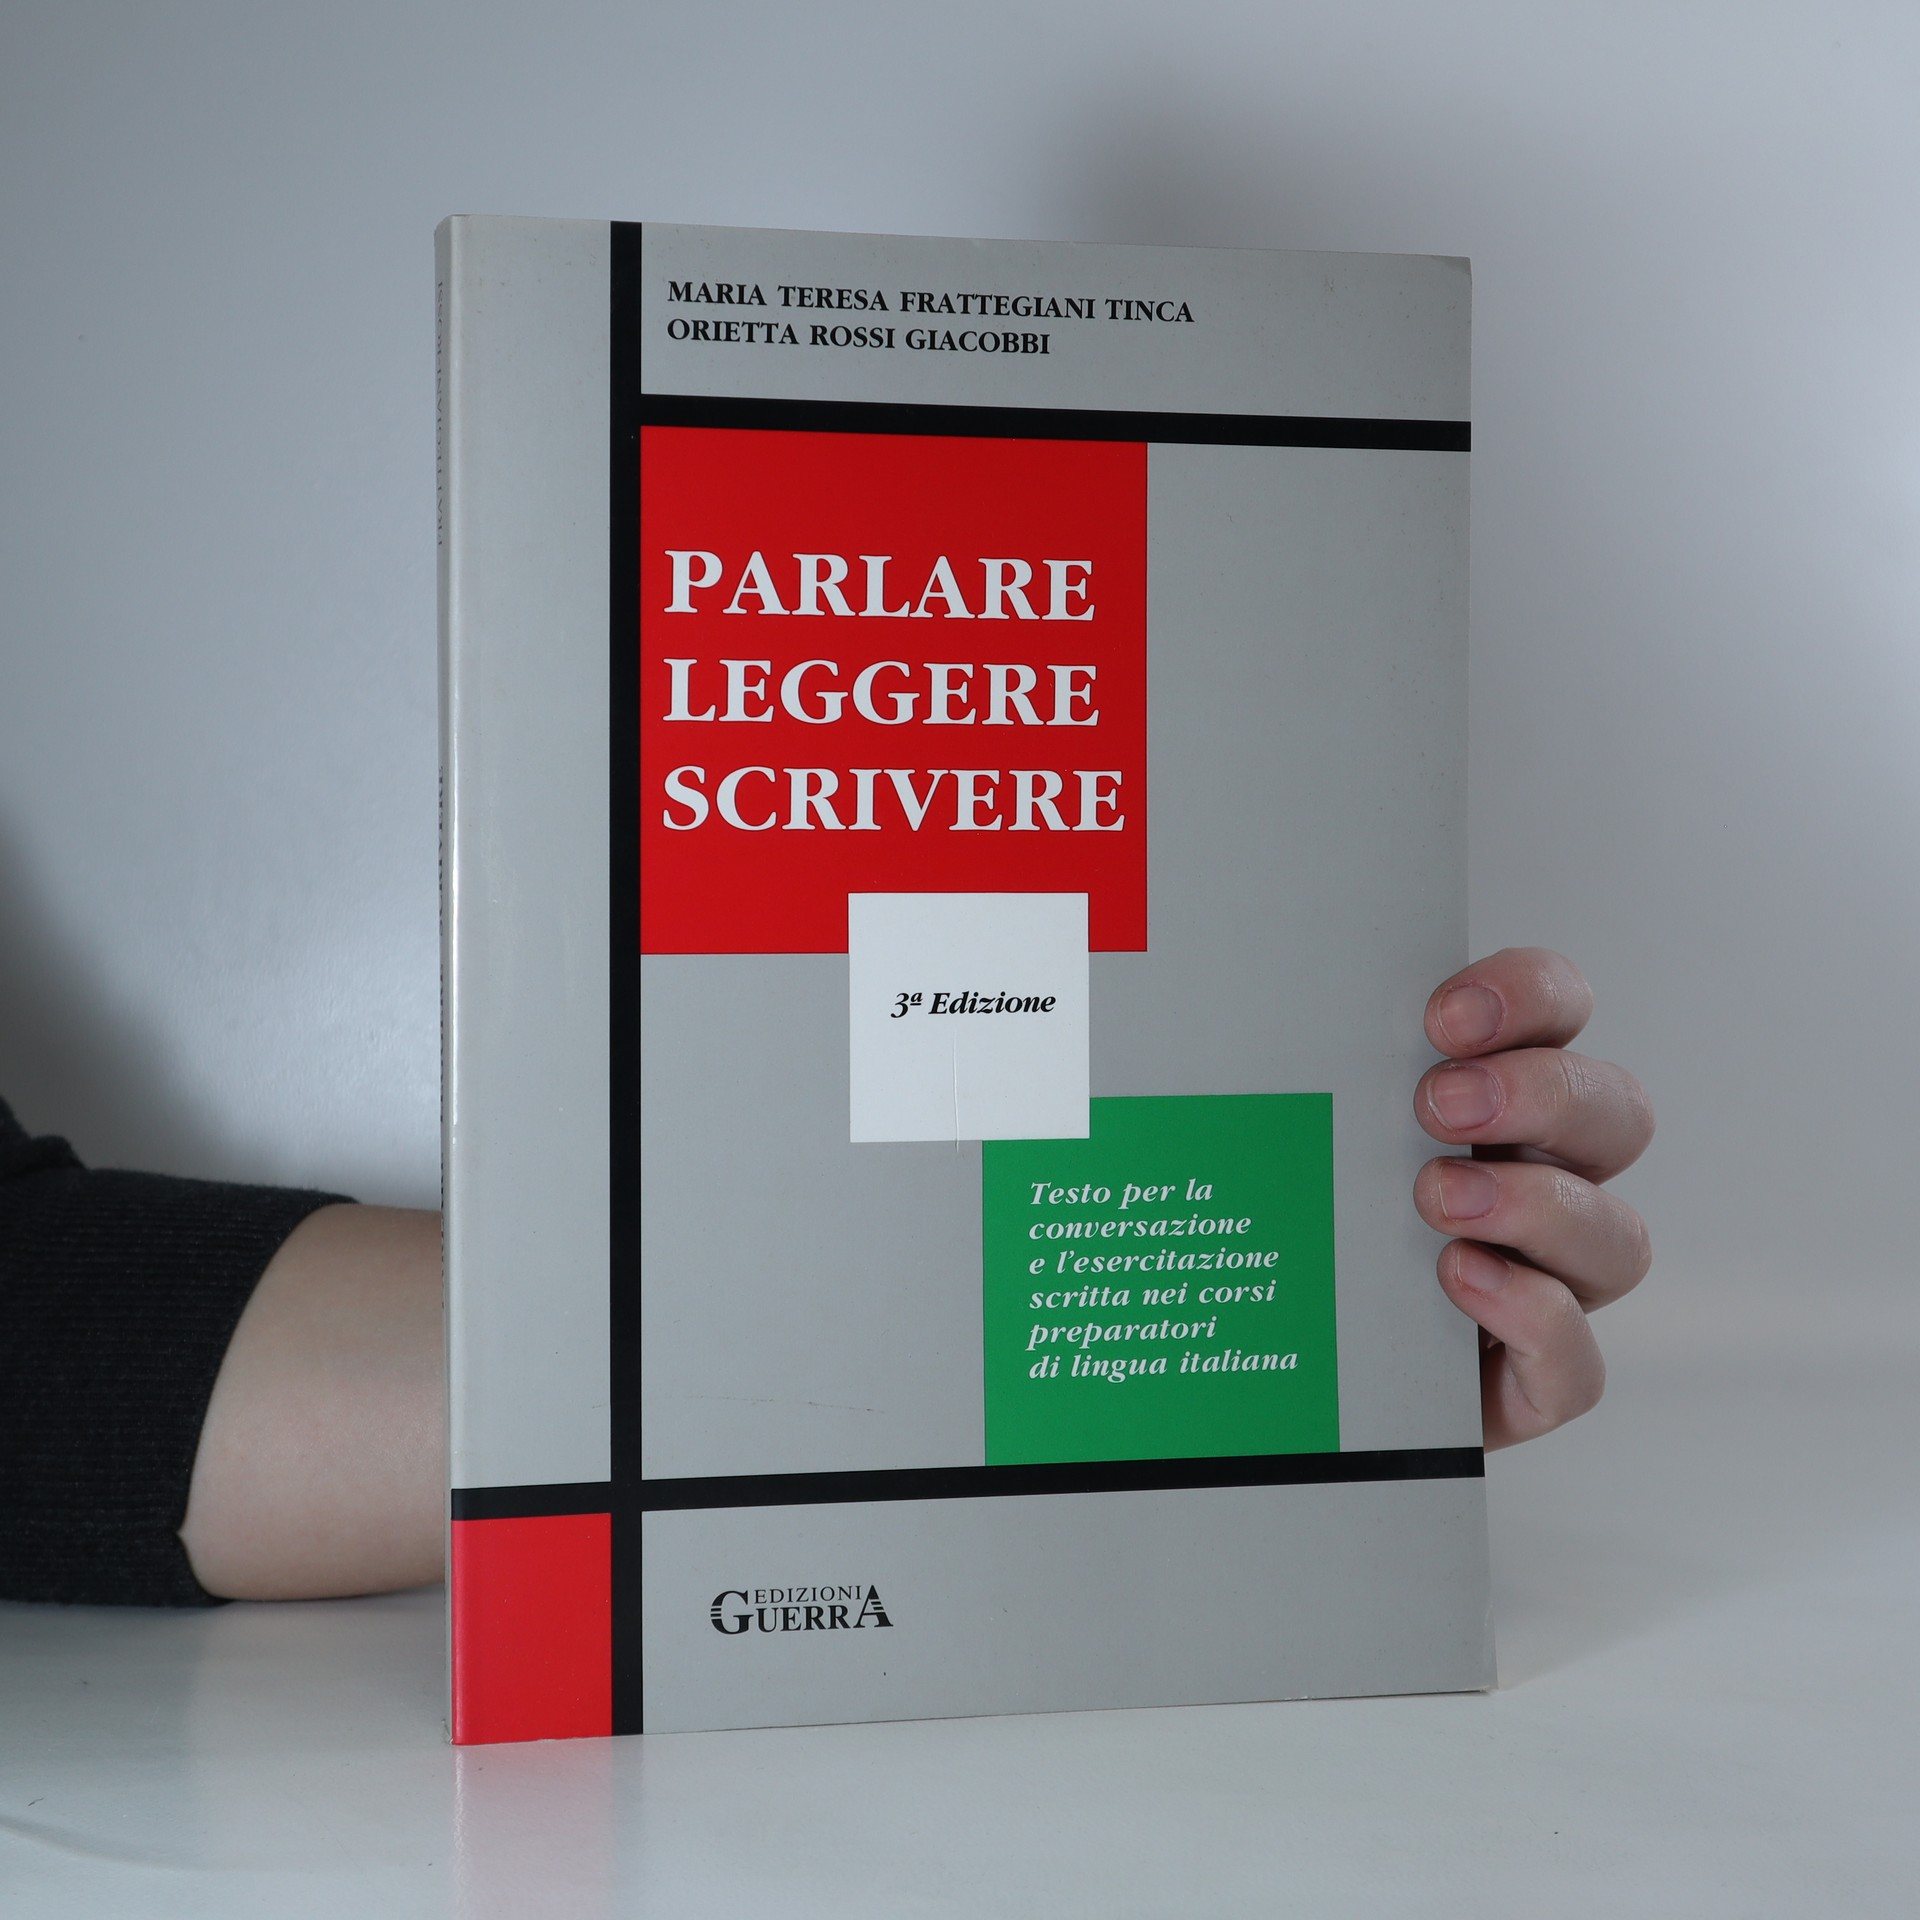 antikvární kniha Parlare, leggere, scrivere, 2003